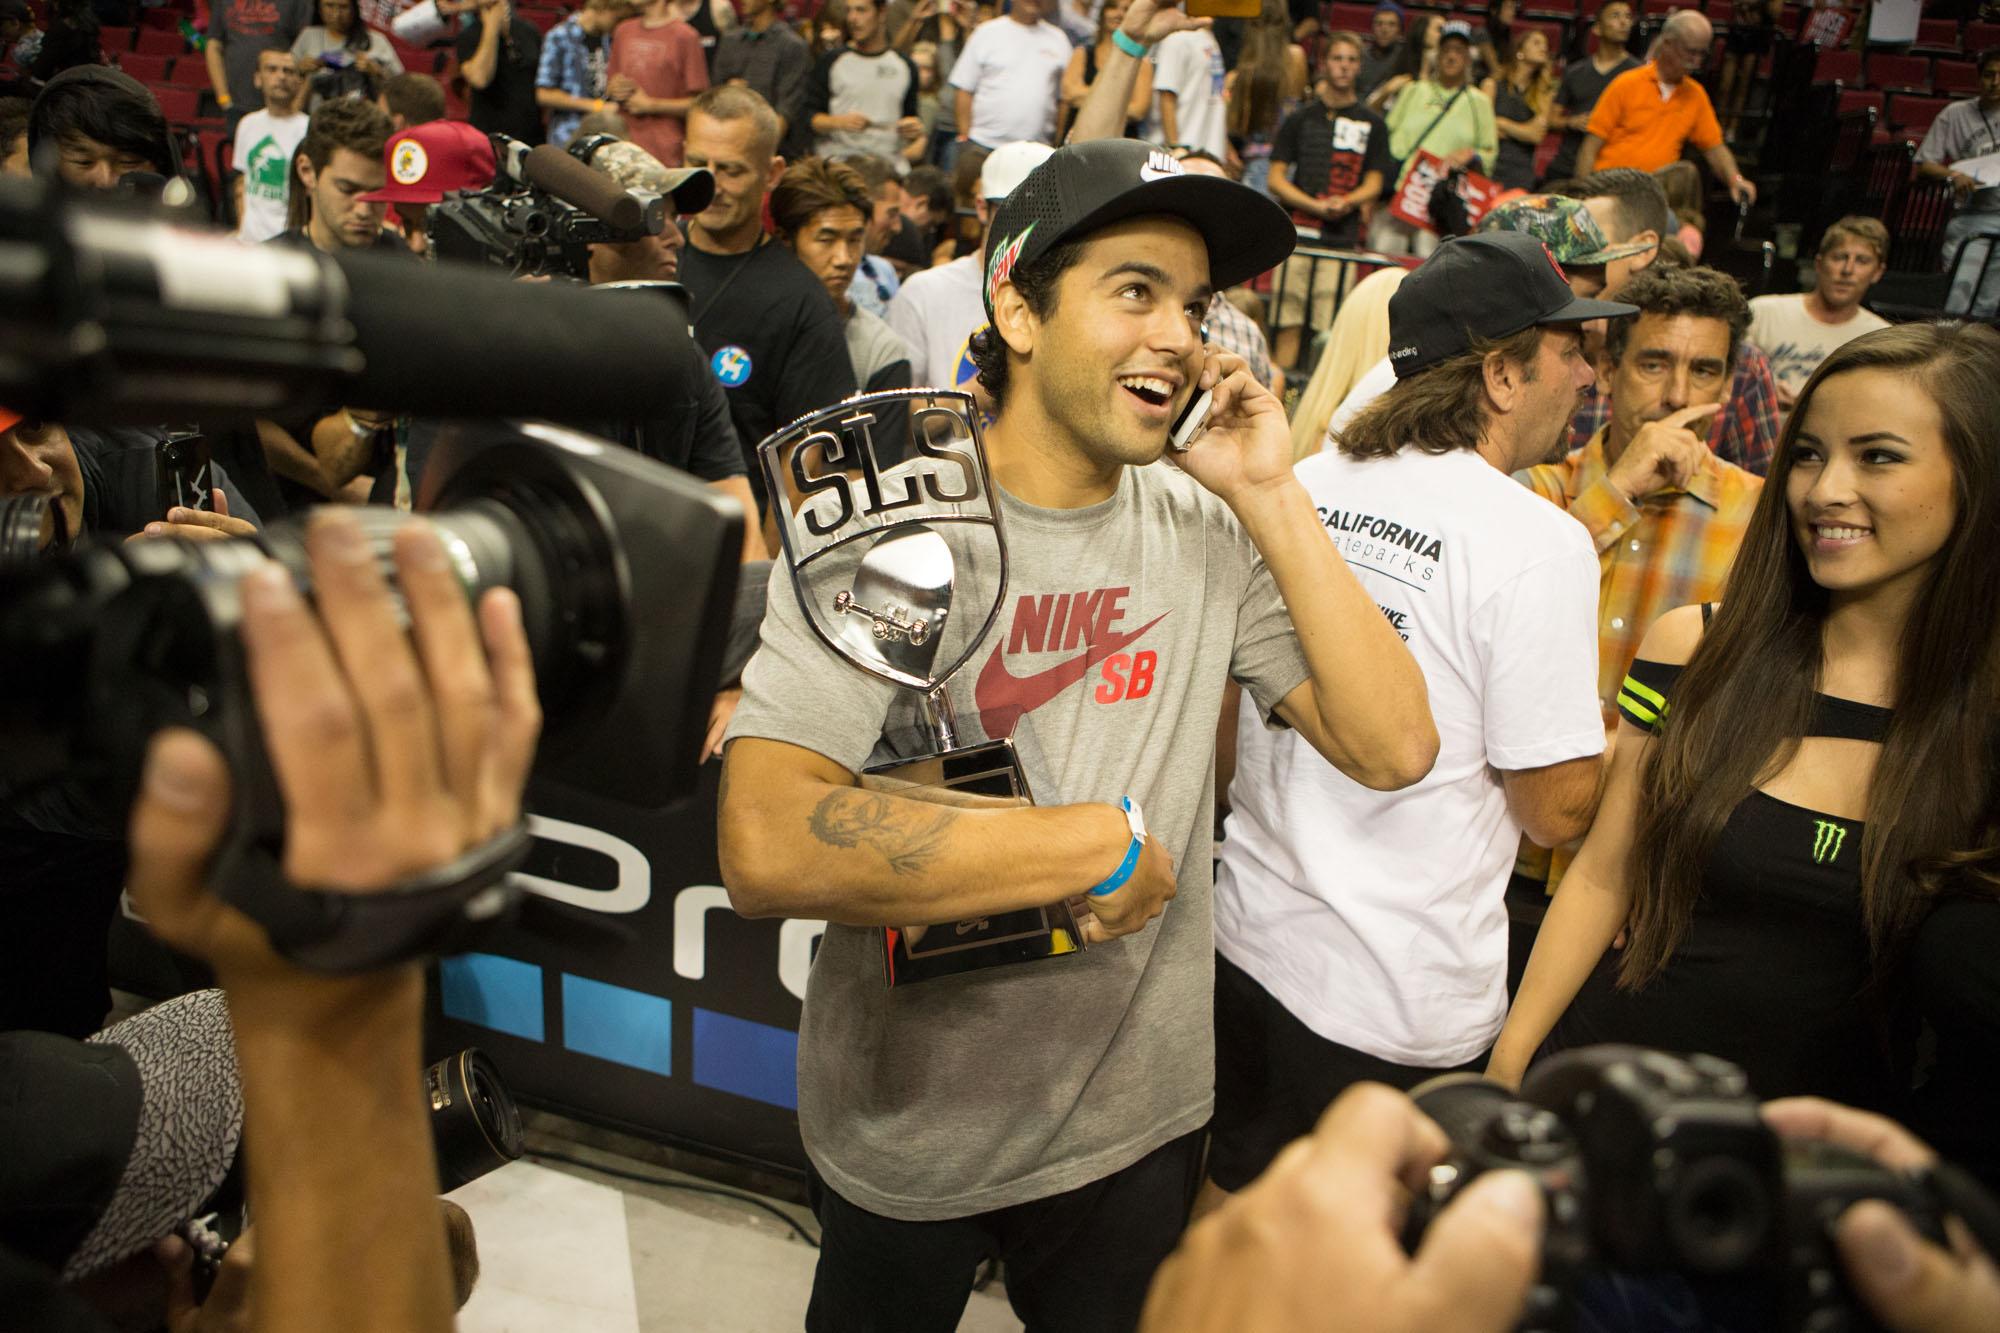 Street League Skateboarding 2013 em Portland